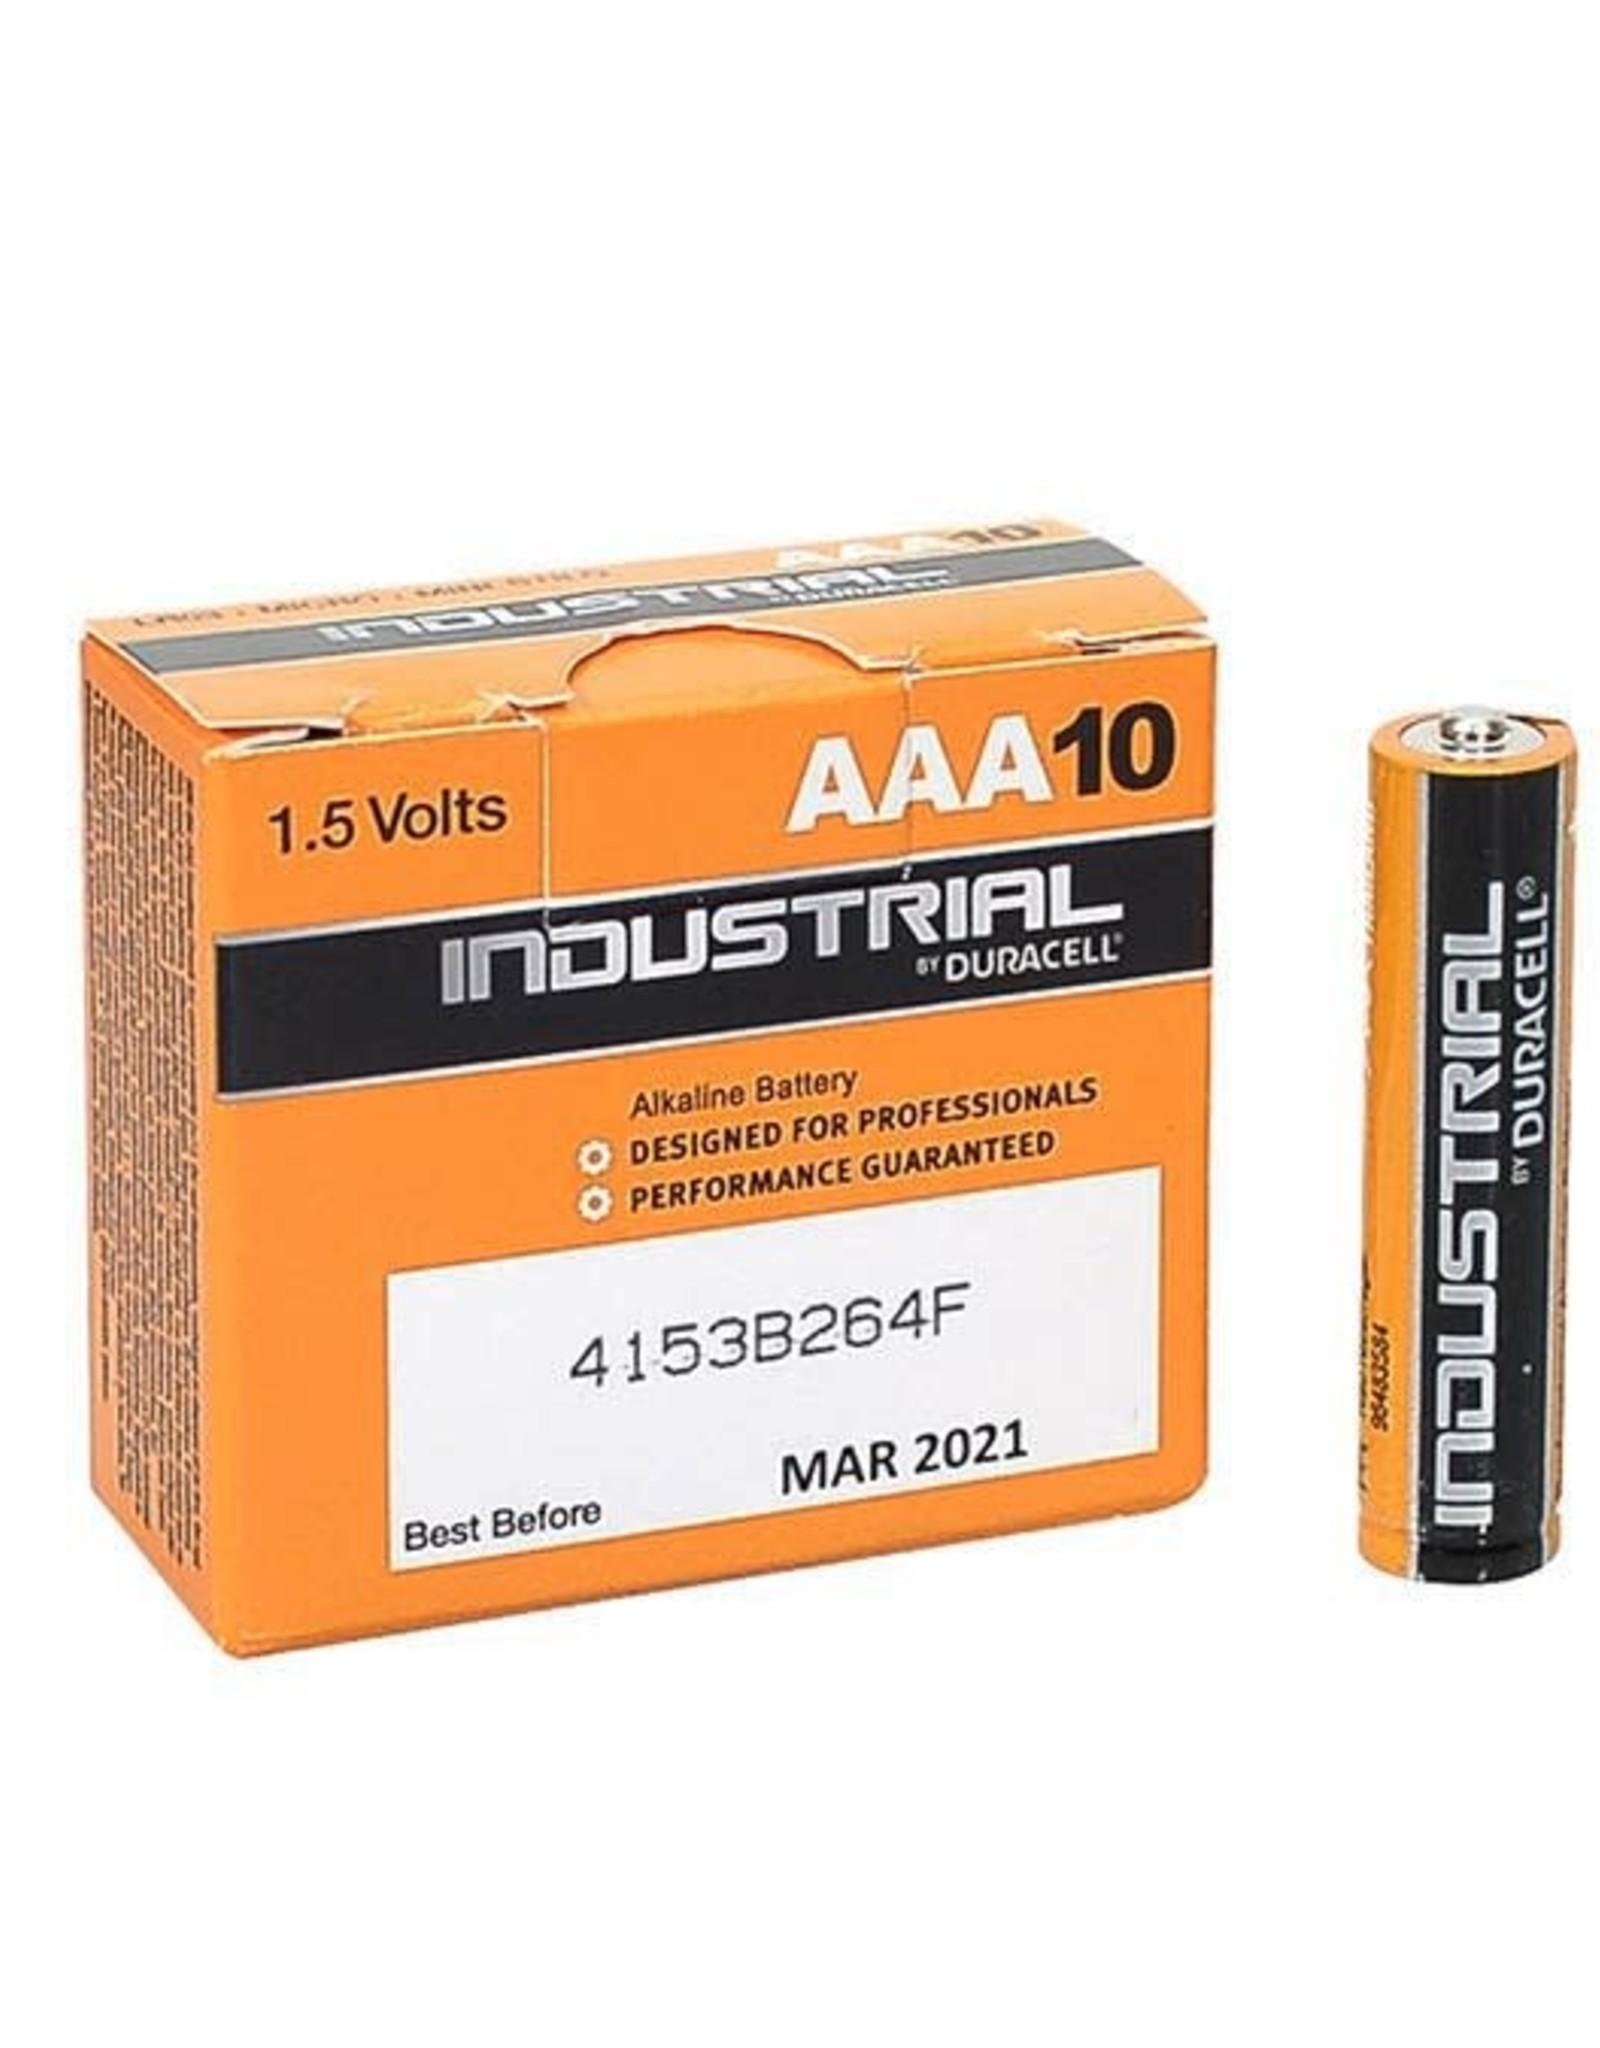 DURACELL batterij aaa industrial, PER STUK